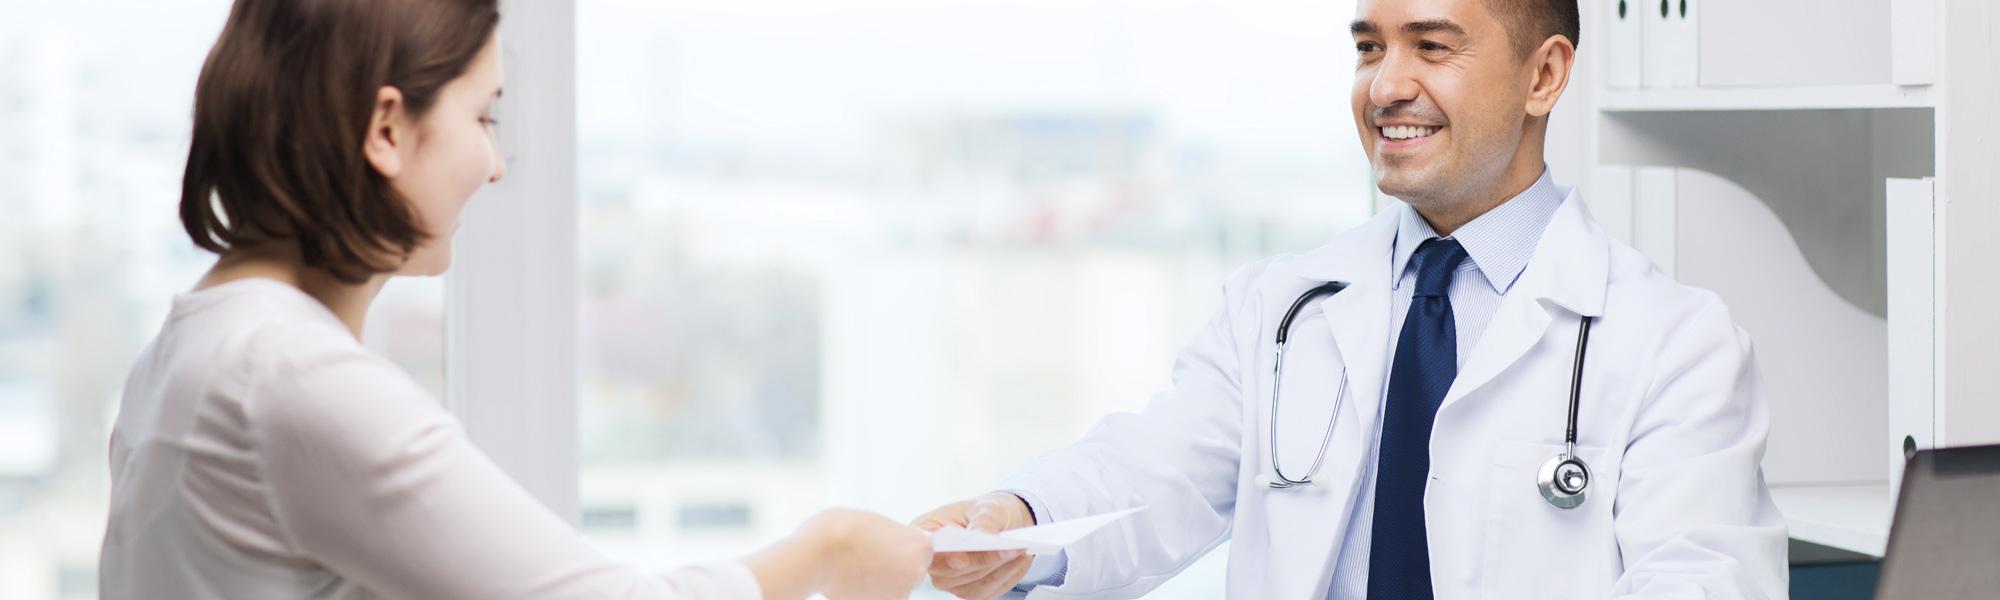 medicina integrativa clinica ilion villaviciosa de odón